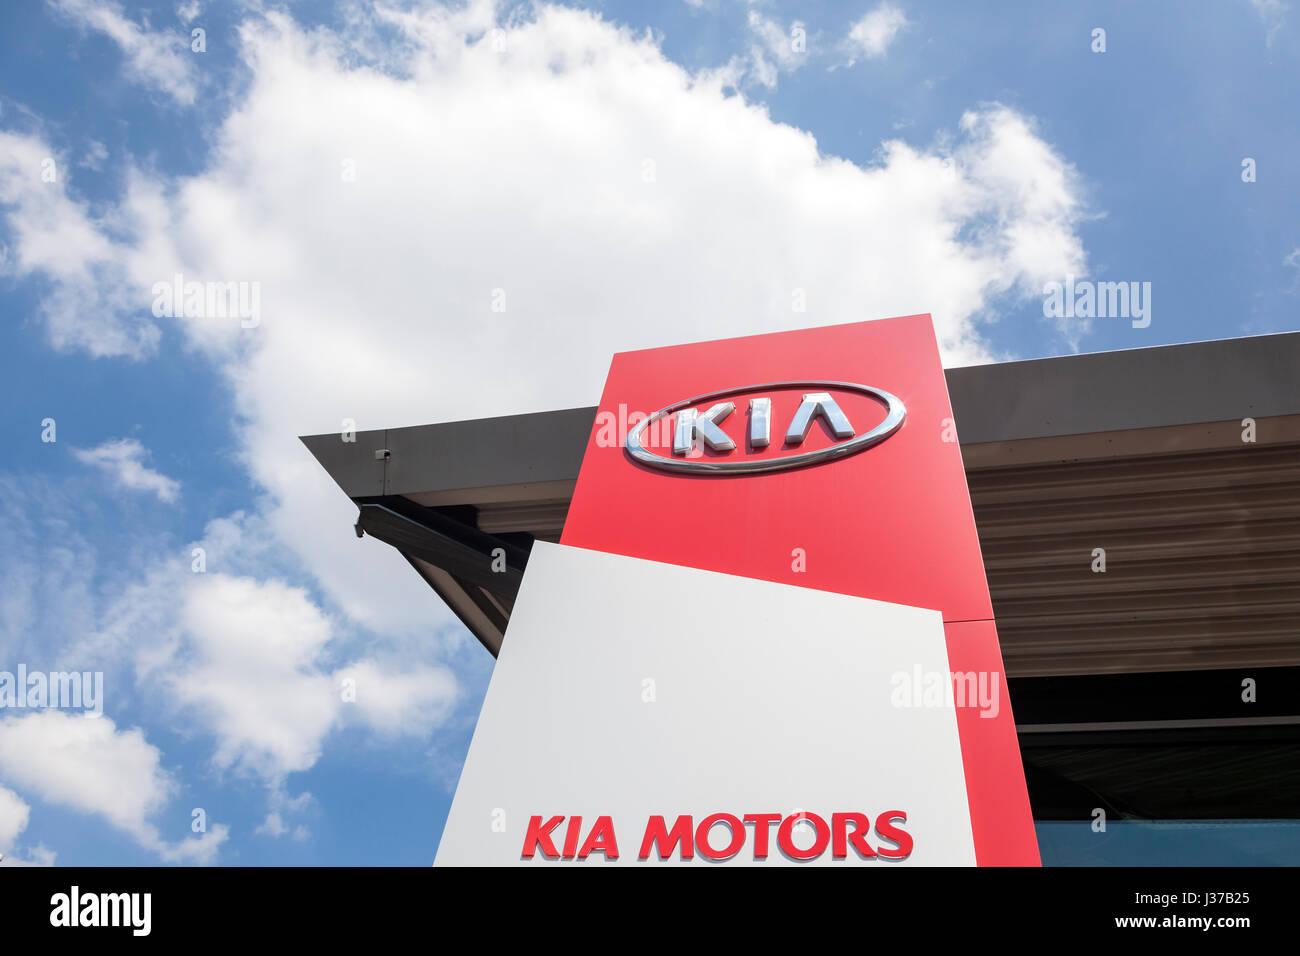 Frankfurt, Germany - March 30, 2017: Kia Motors dealership in the city of Frankfurt. Toyota is world's leader - Stock Image